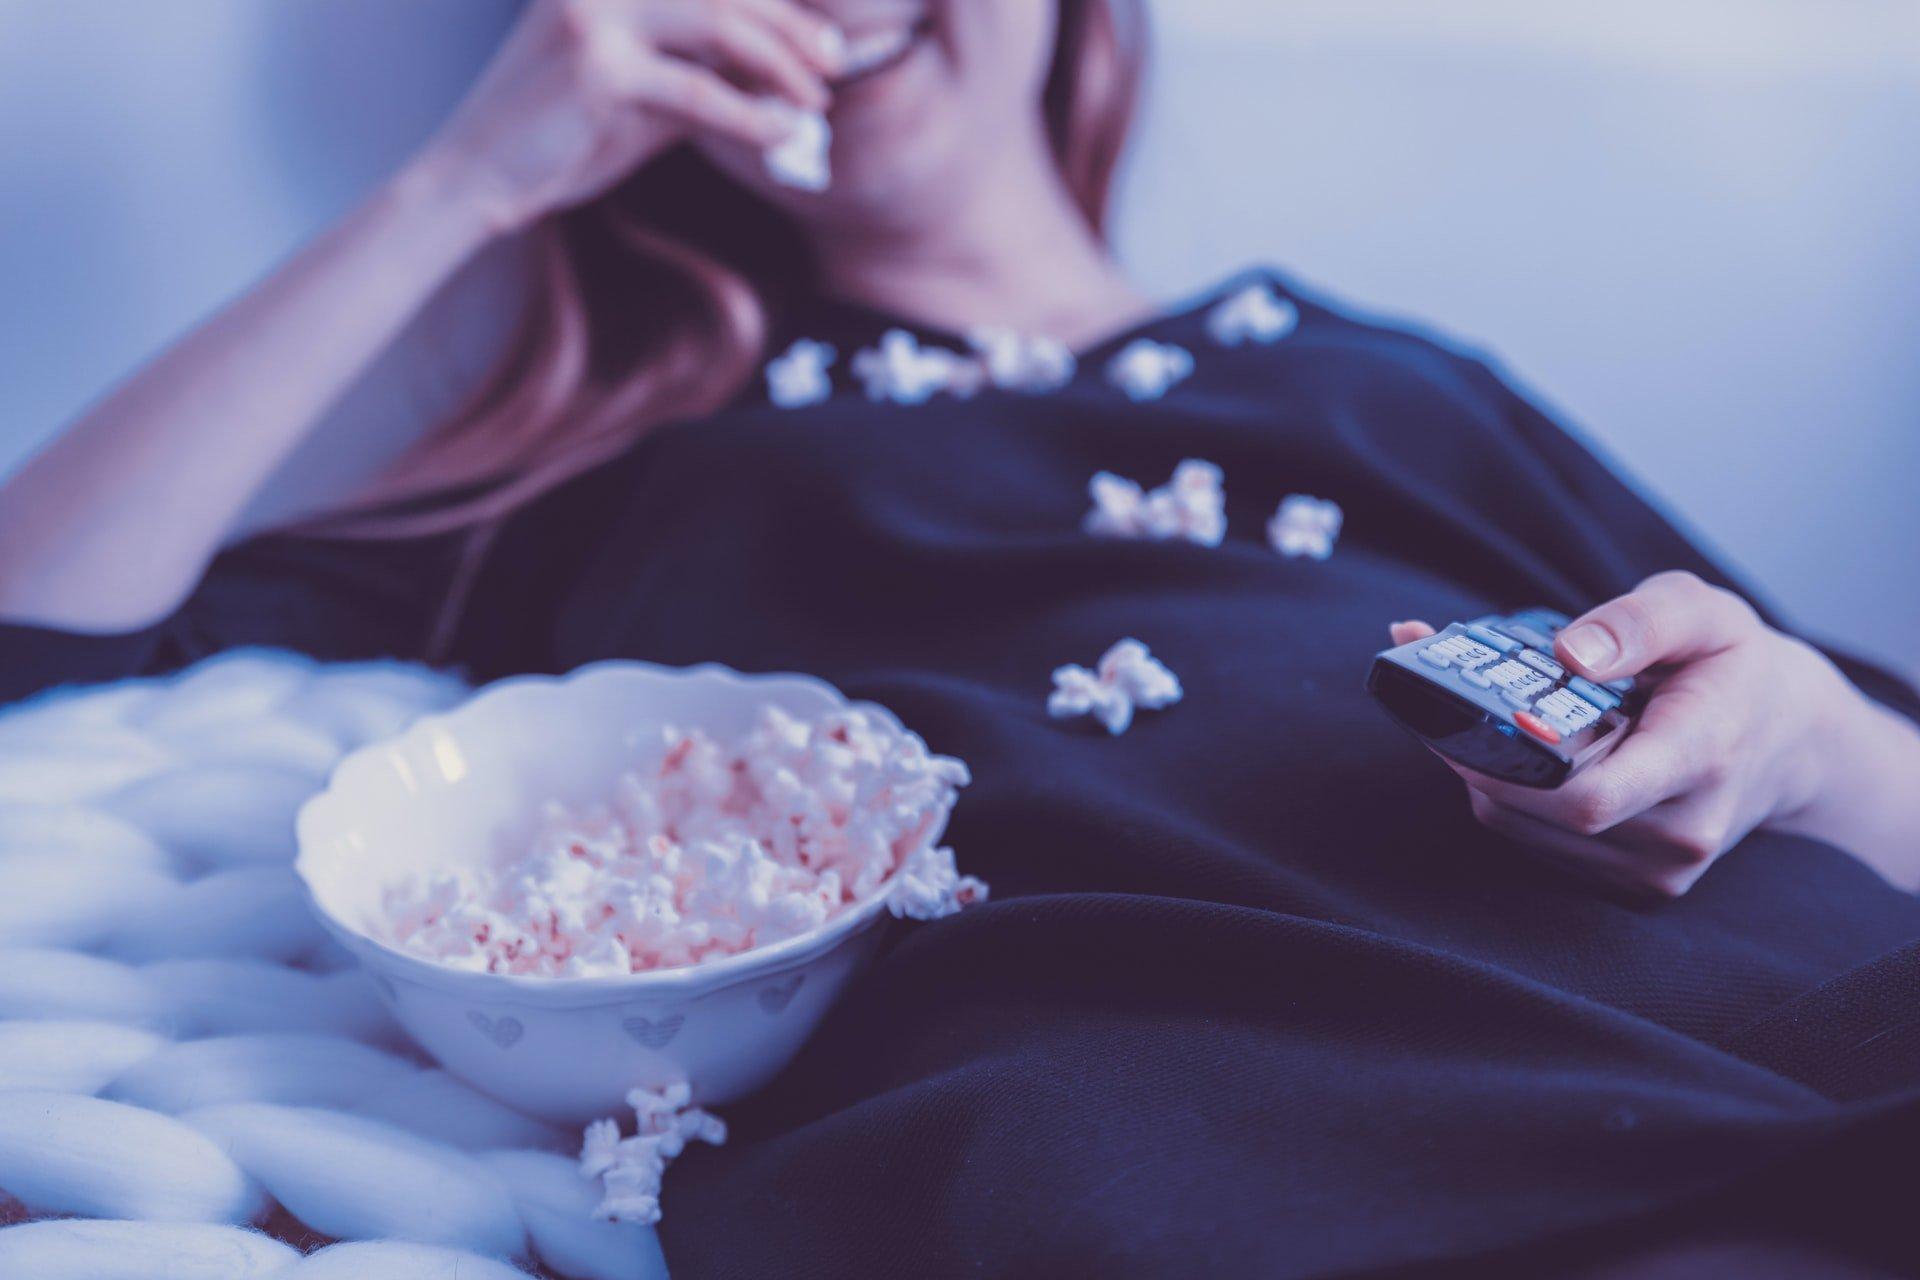 12 Flixtor Alternatives for Free Movies